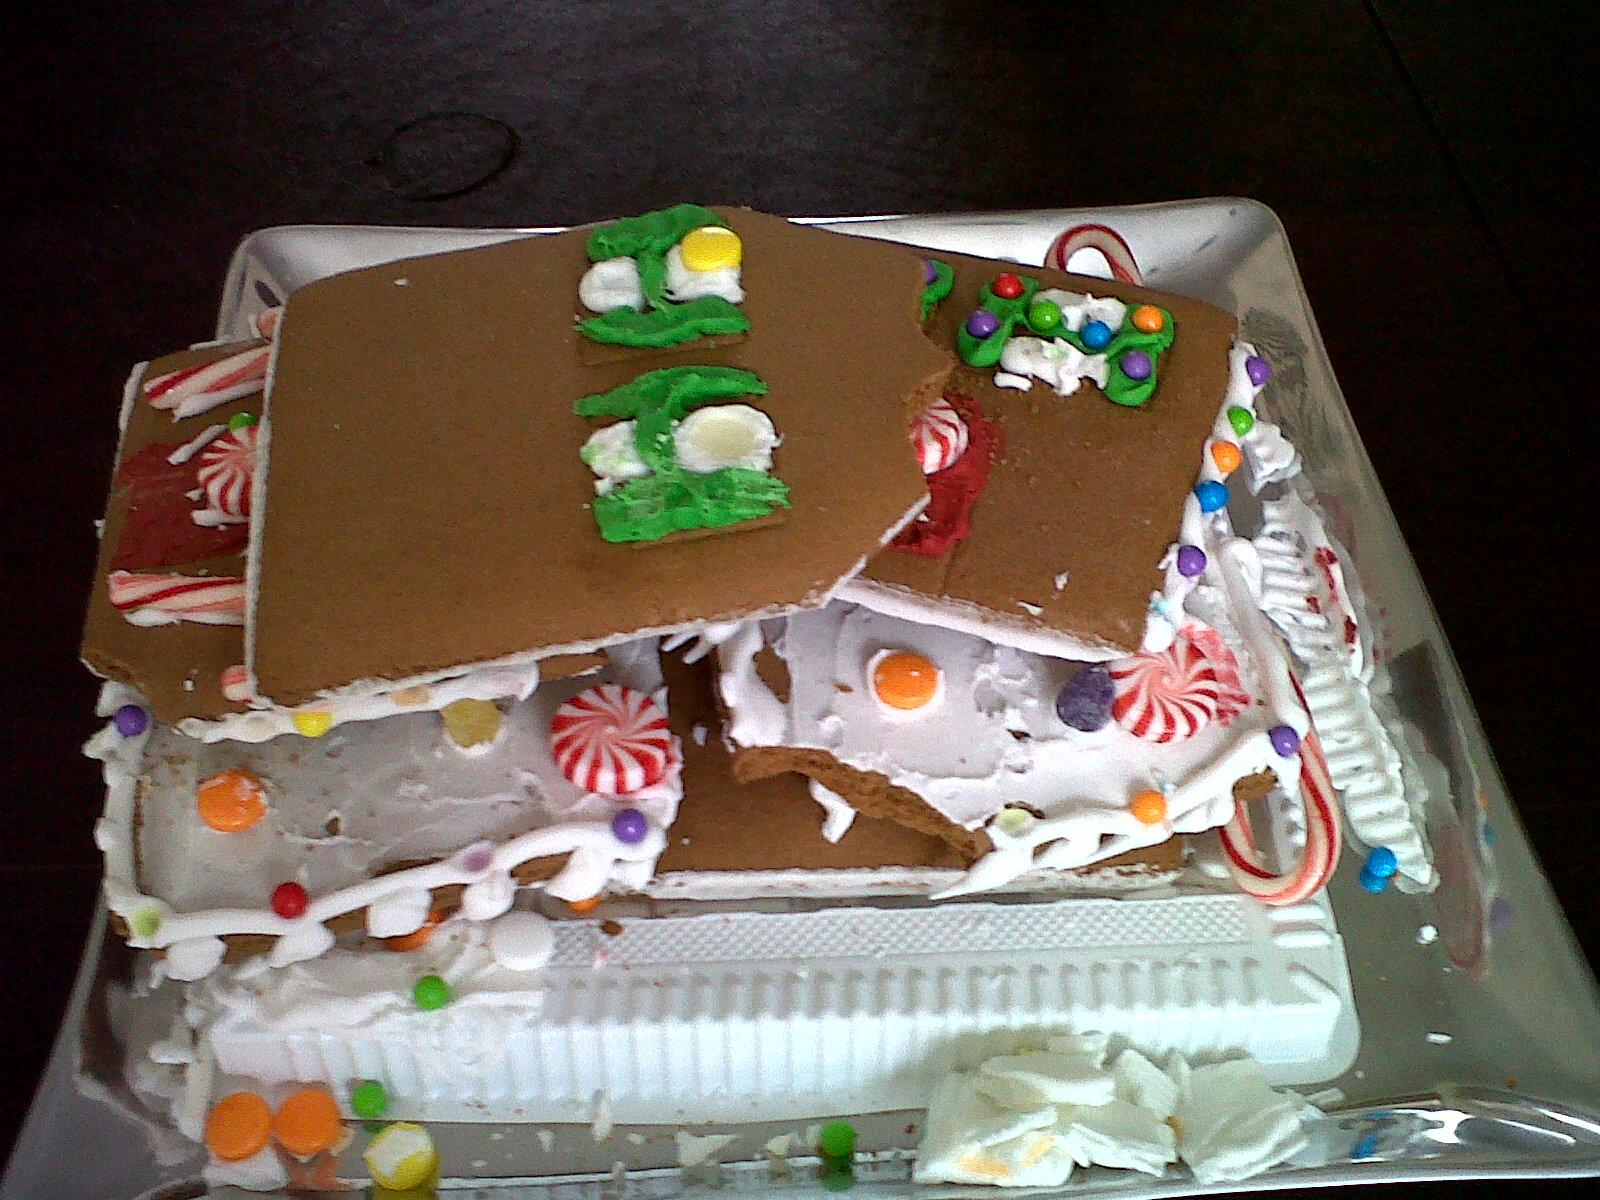 Redneck Gingerbread Houses Cardboard-like gingerbread